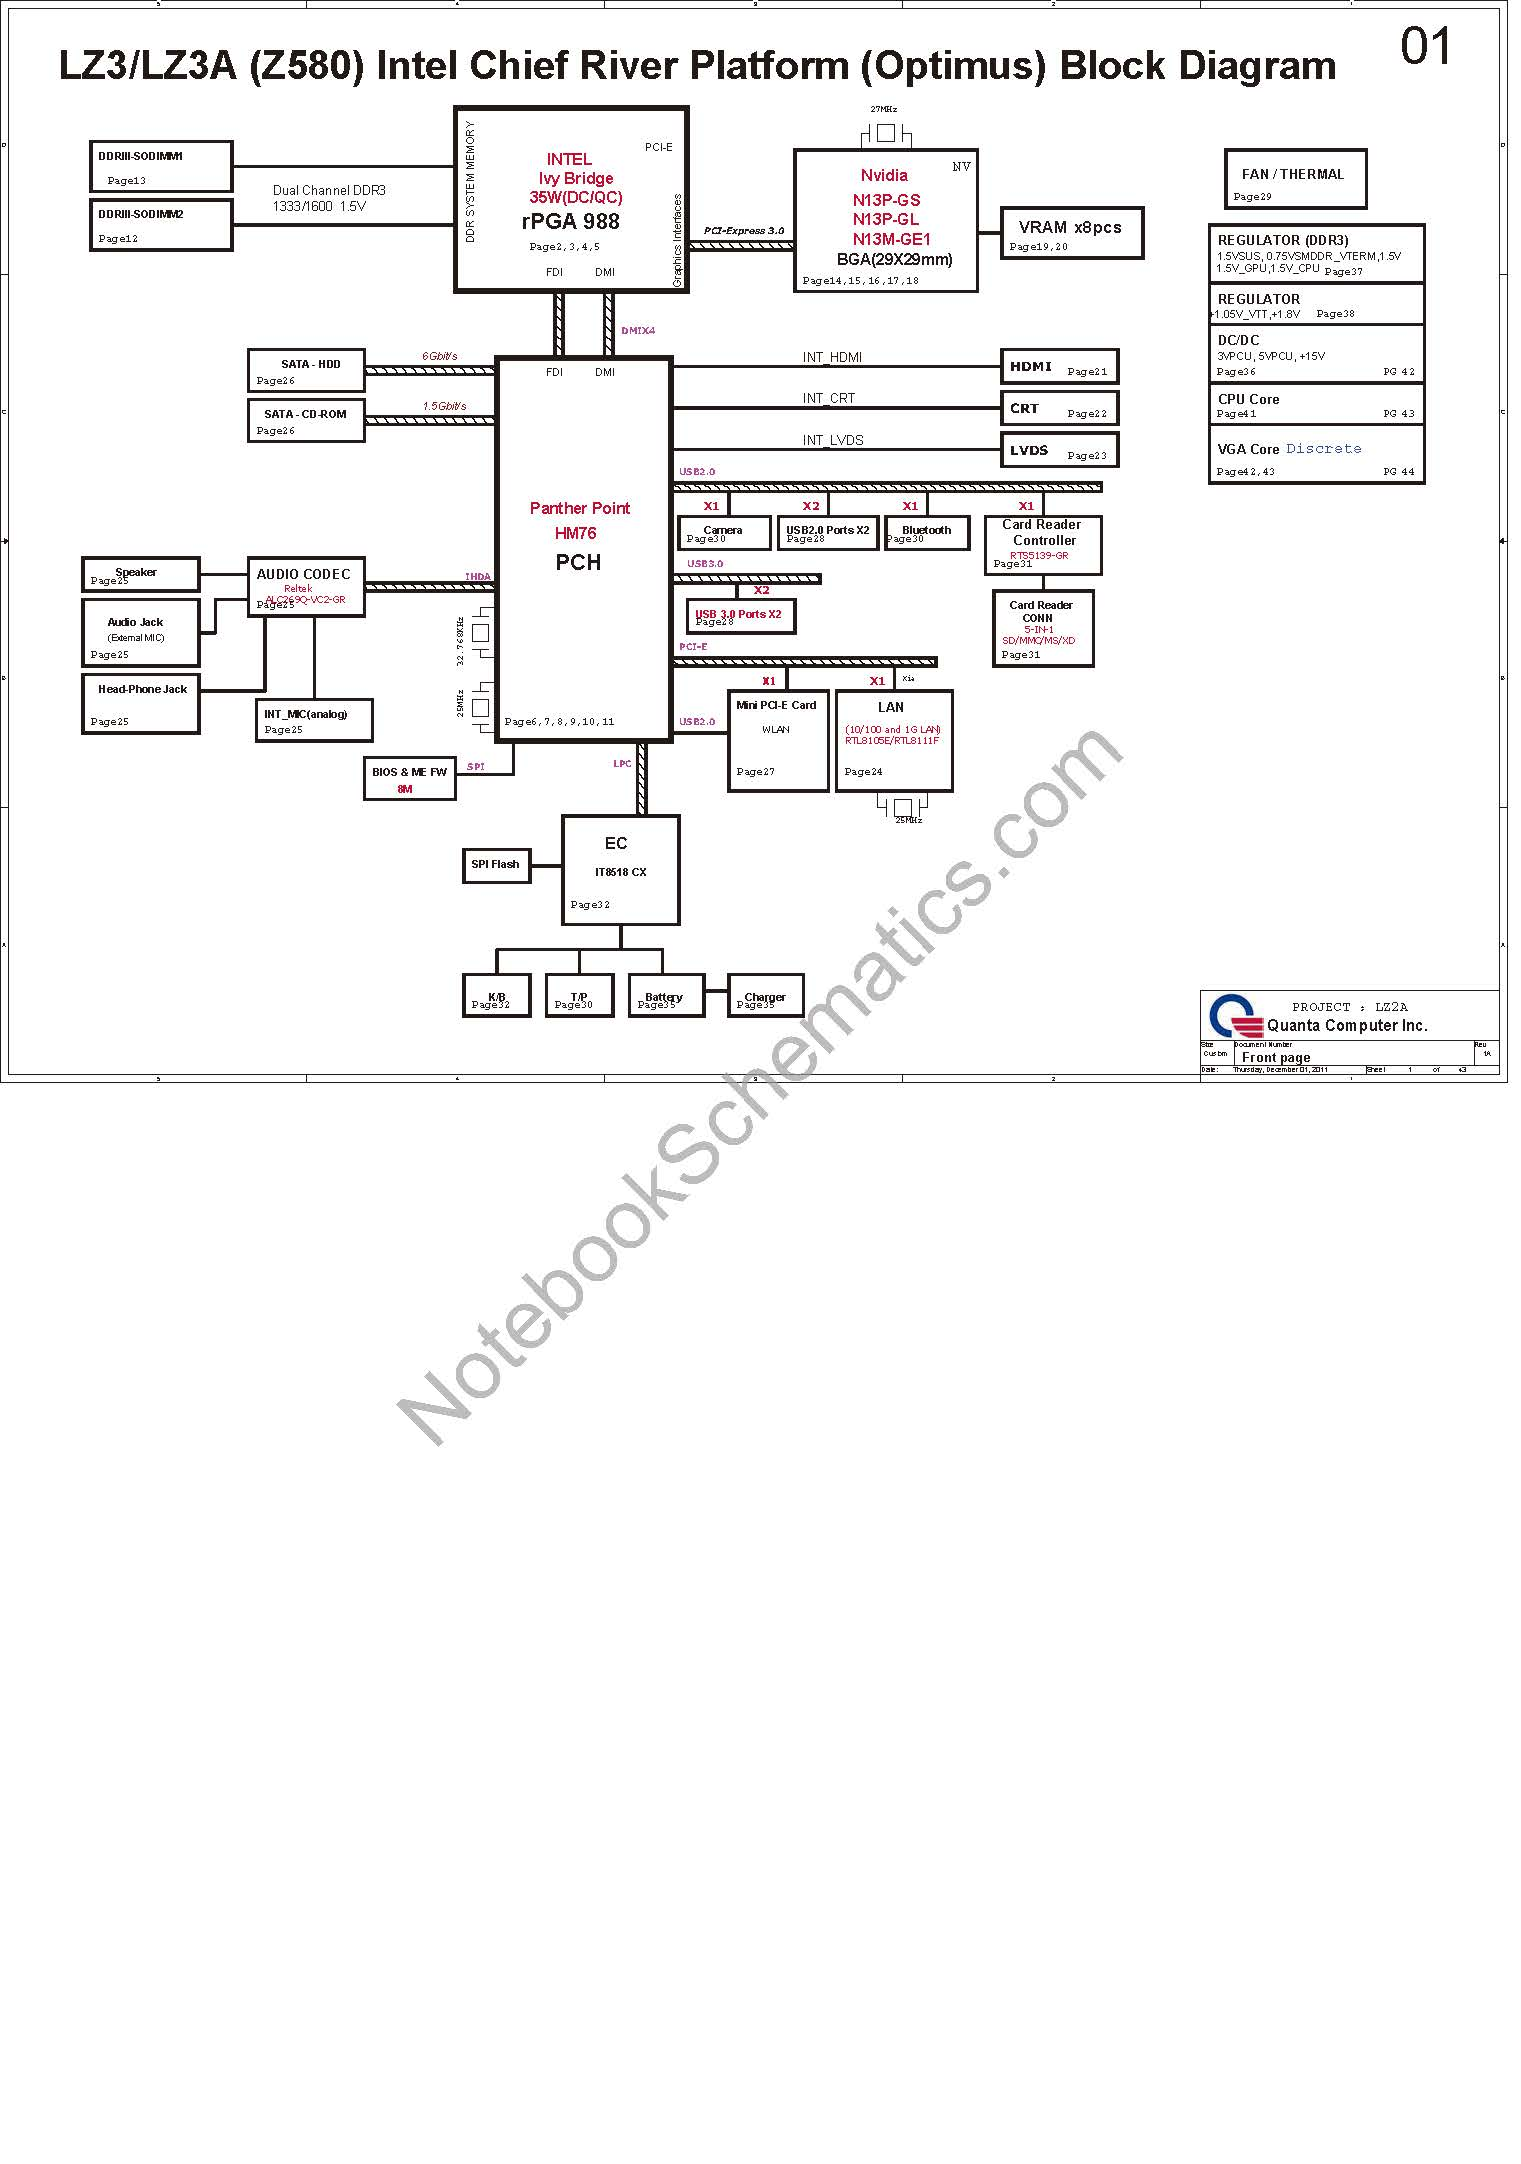 Lenovo Ideapad Z580 schematic – DA0LZ3MB6G0